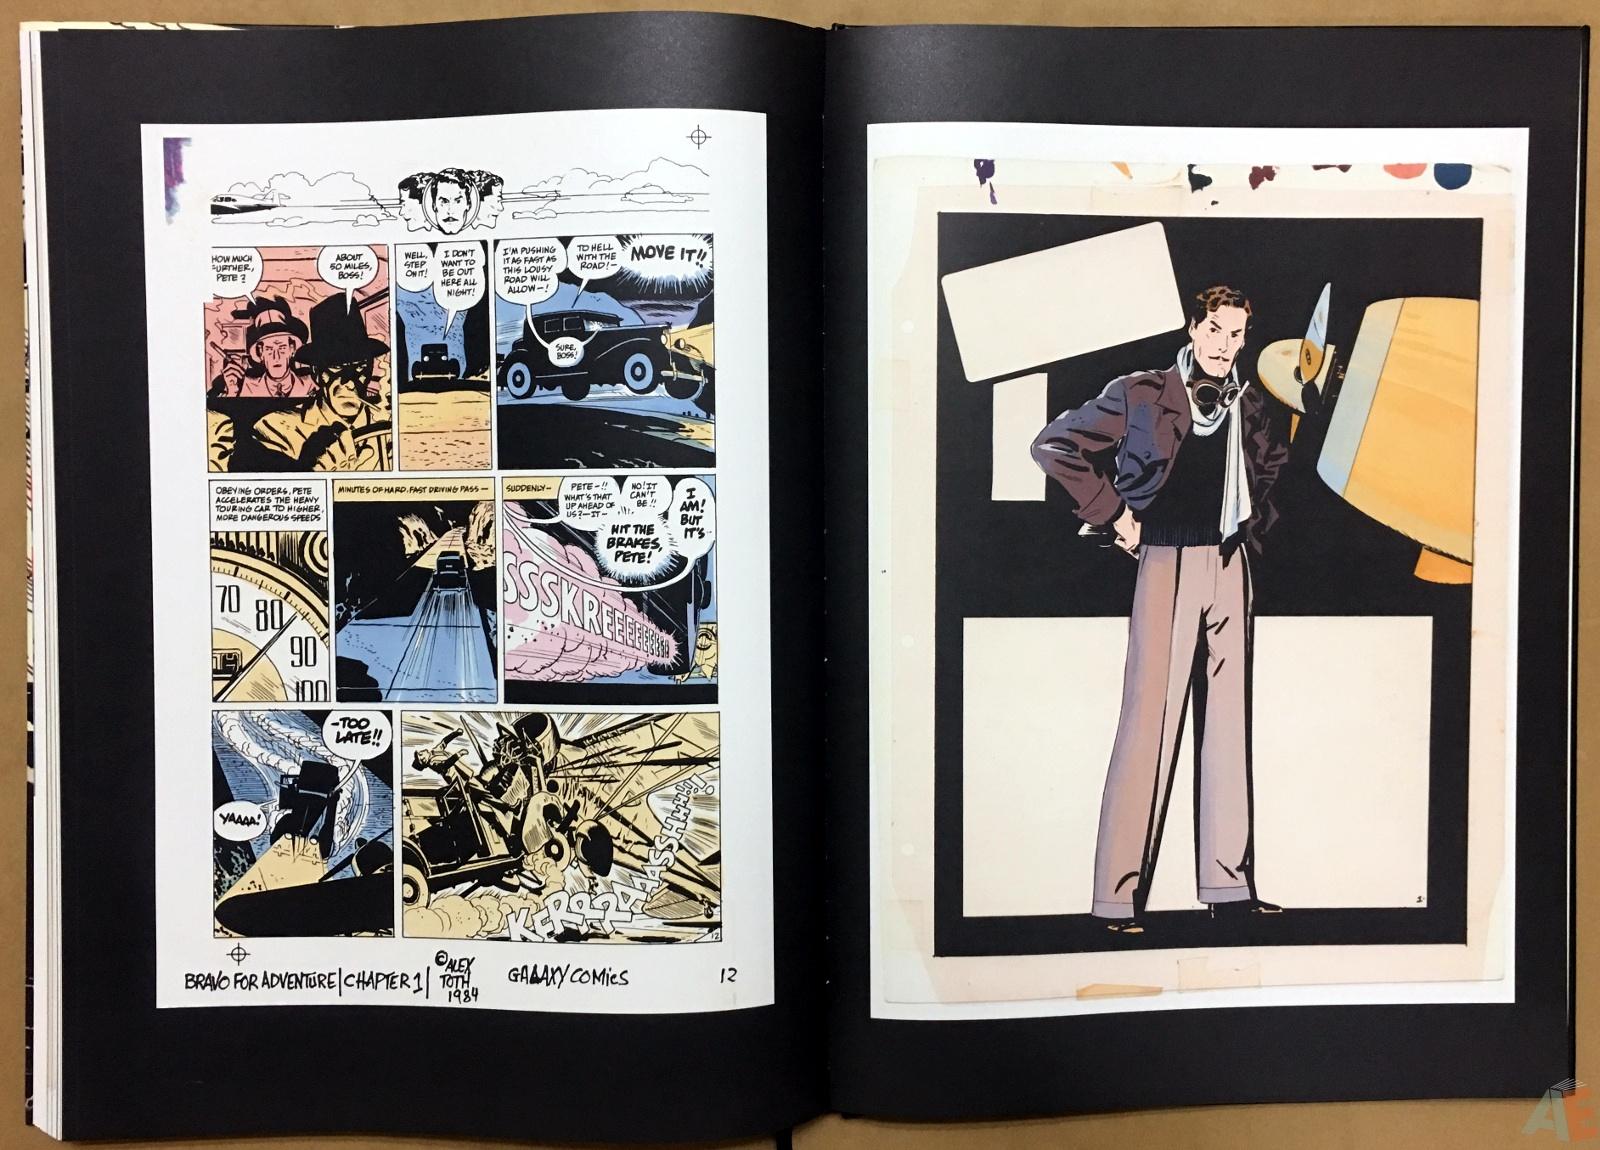 Alex Toth's Bravo For Adventure Artist's Edition 40